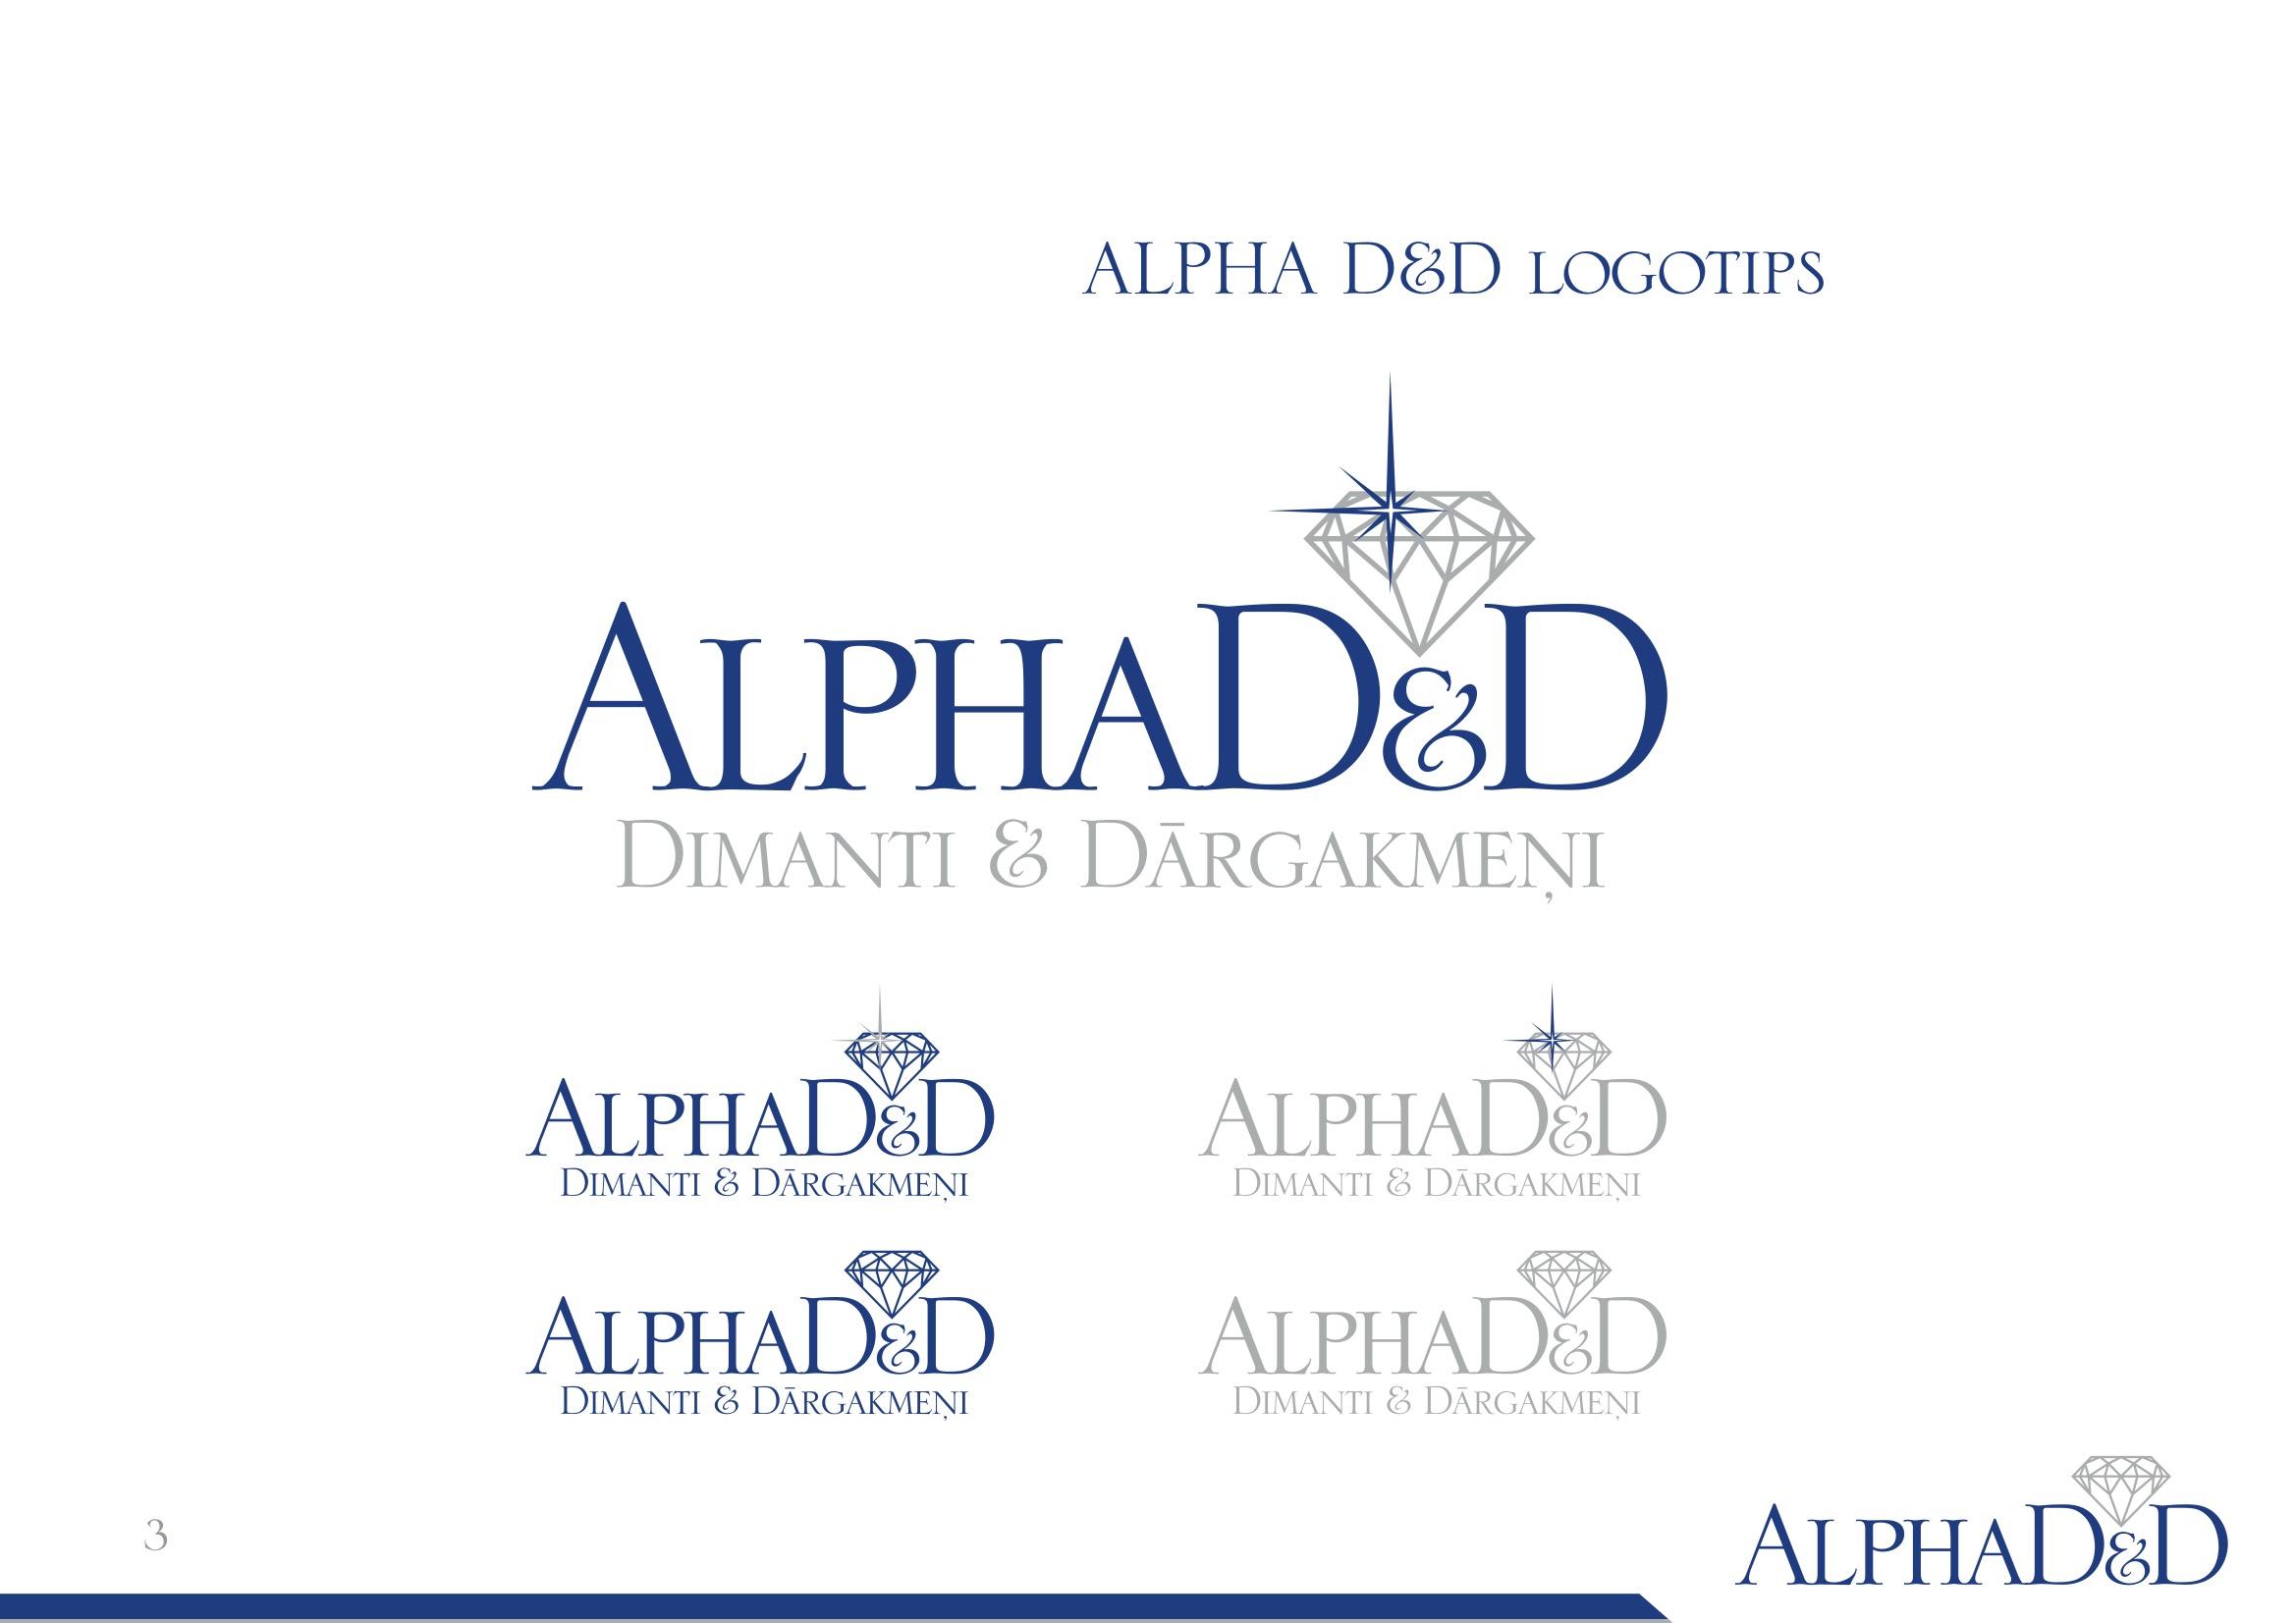 AlphaDD_Stils 3